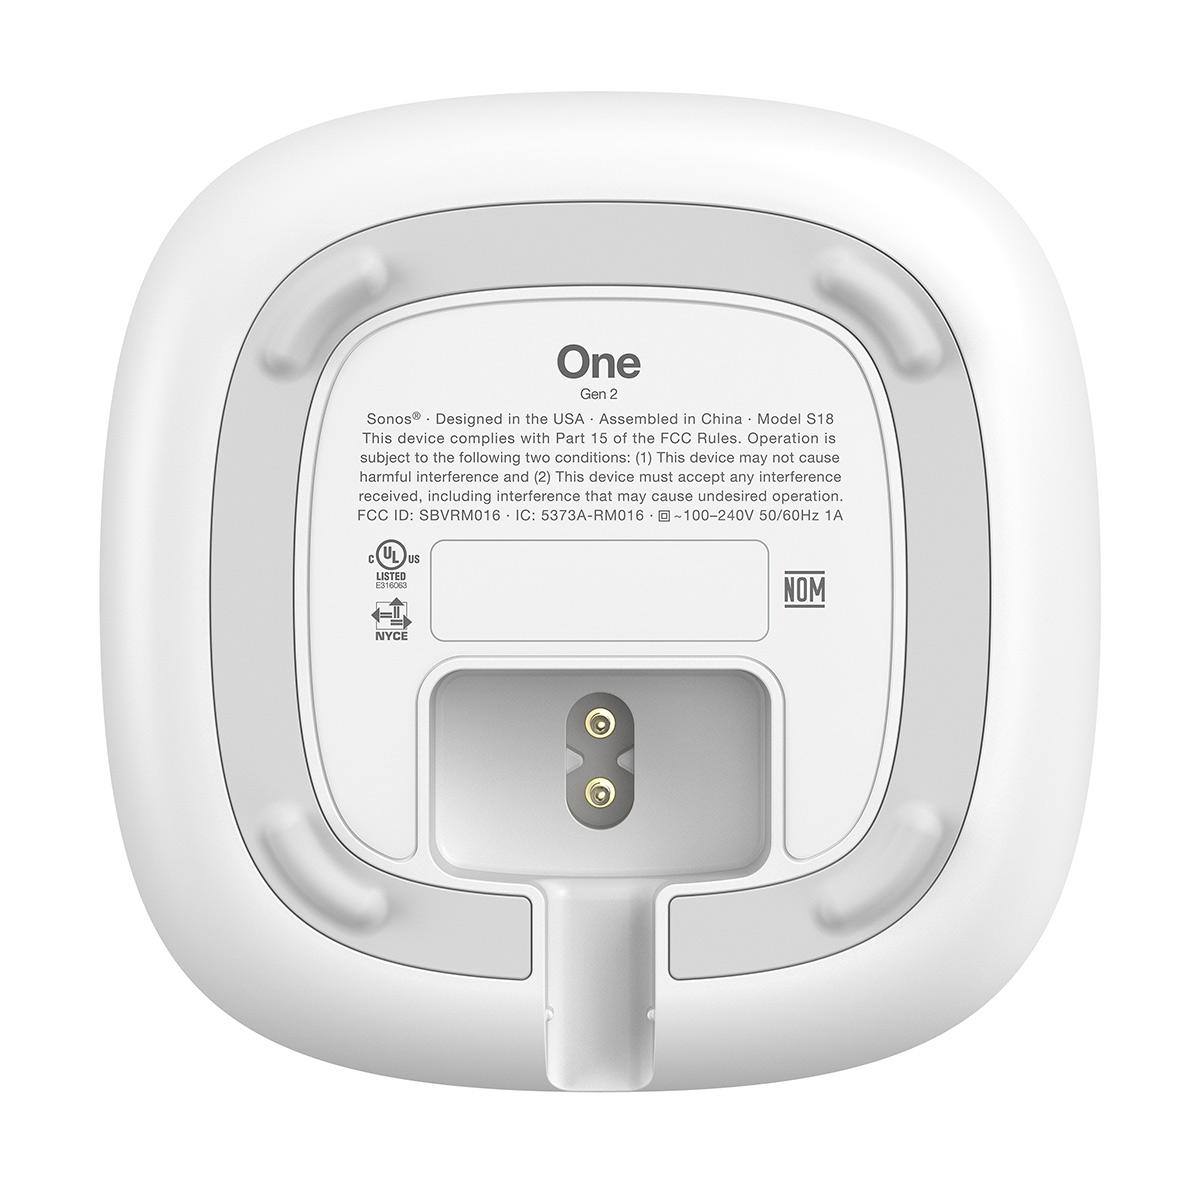 Sonos-One-Voice-Controlled-Wireless-Smart-Speaker-Gen-2 thumbnail 19